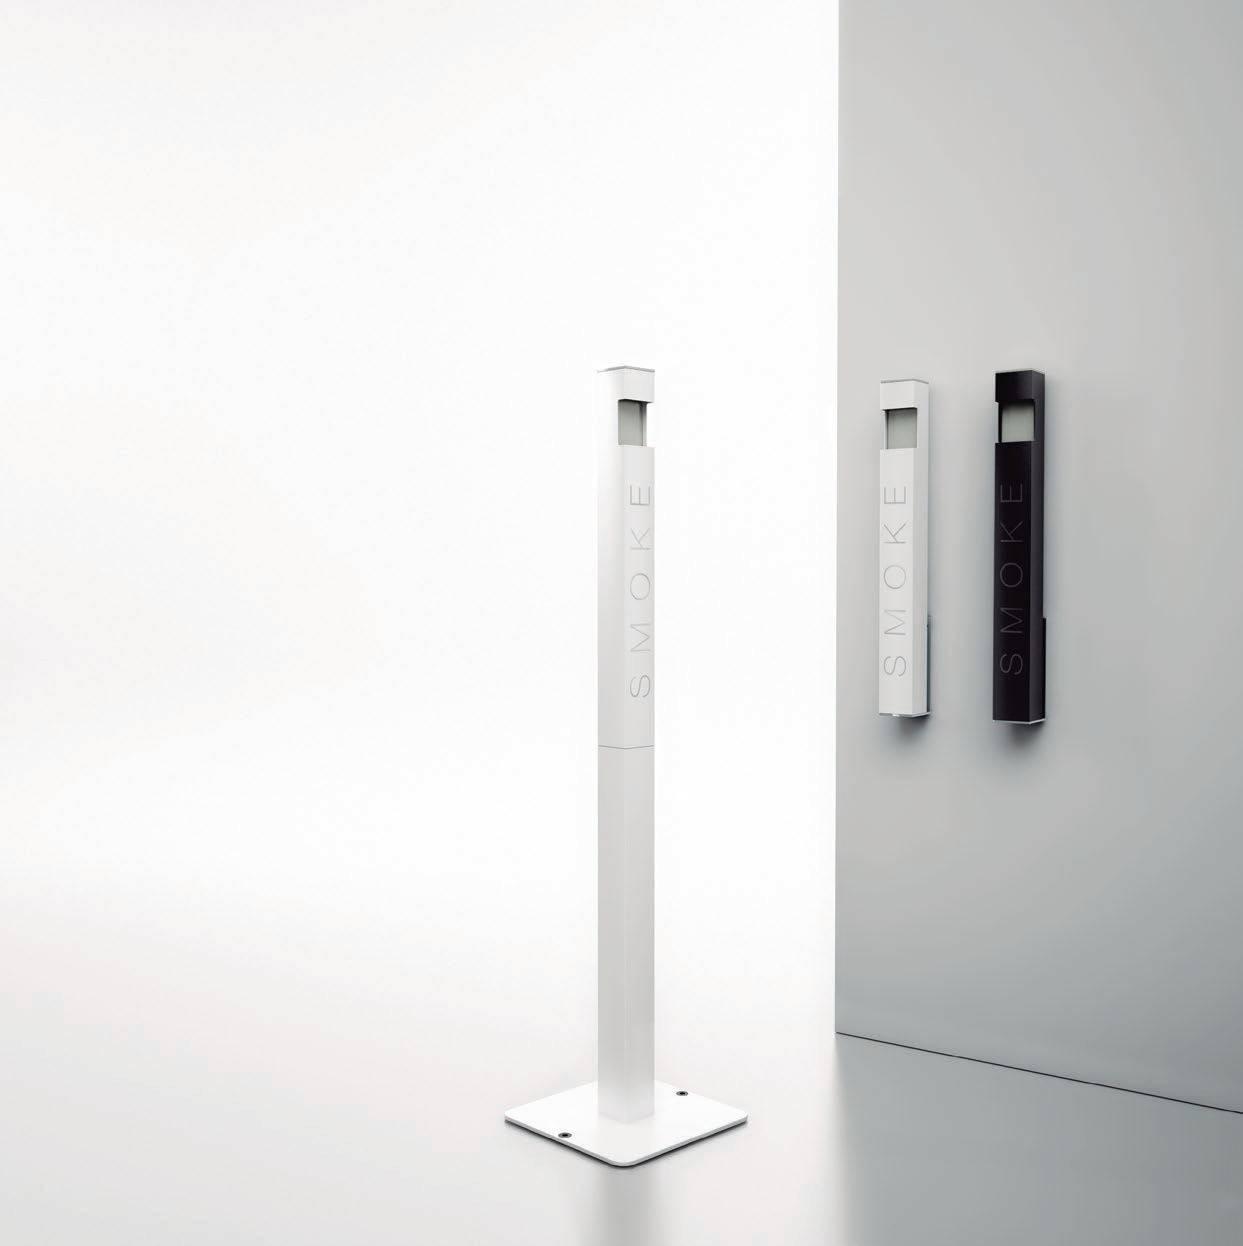 Uispair Modern Floor Type Smoking Set Cigarette Quitting Ashtray